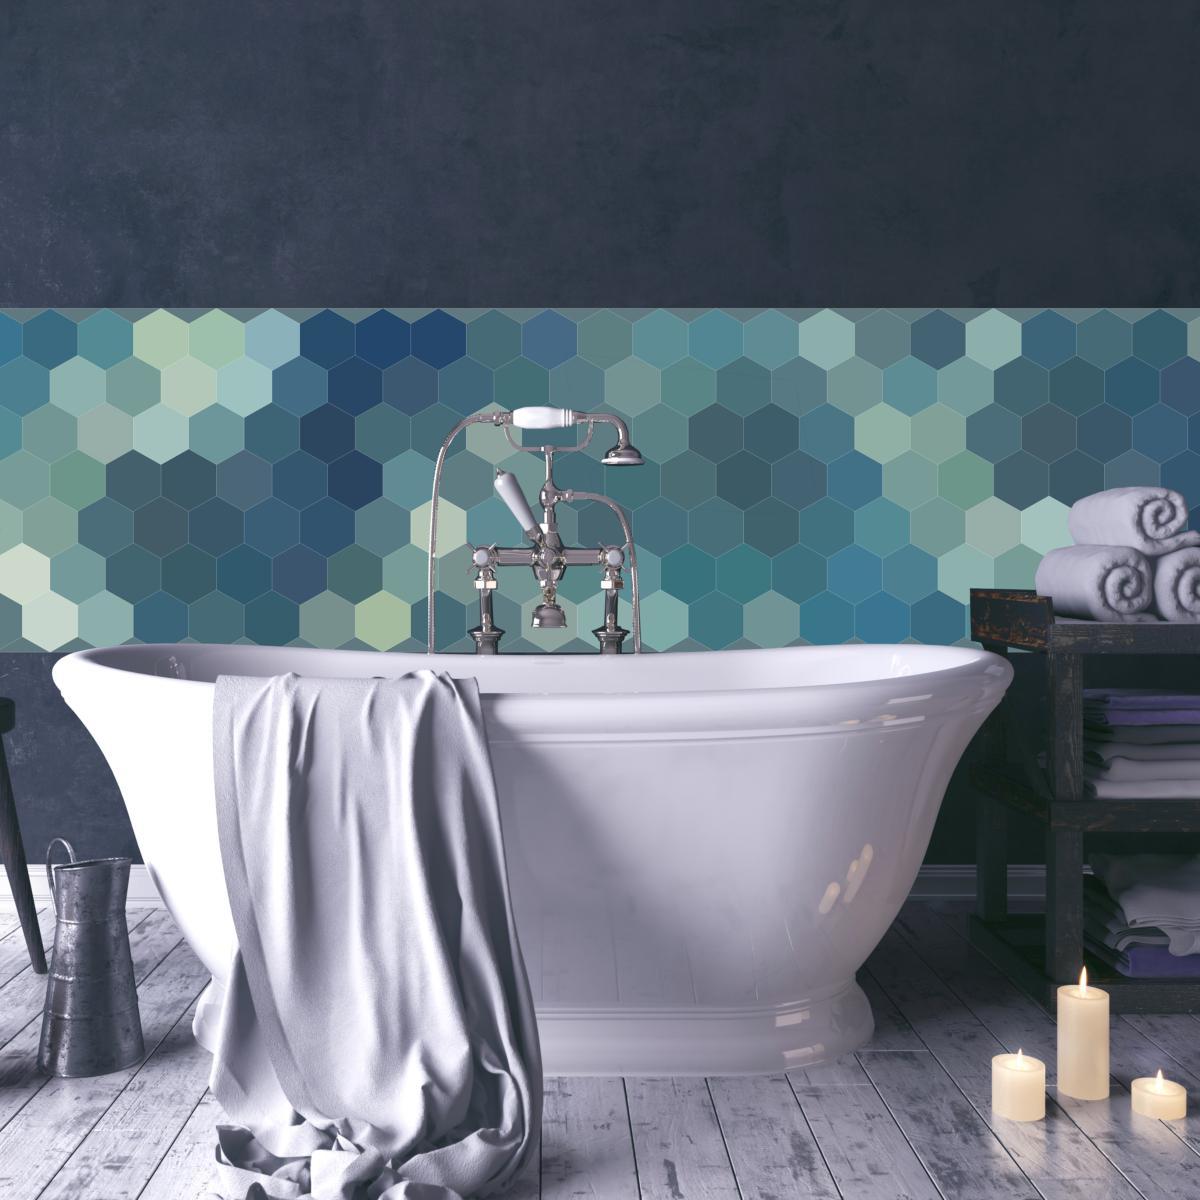 cr dence adh sive carreaux de ciment perrine. Black Bedroom Furniture Sets. Home Design Ideas